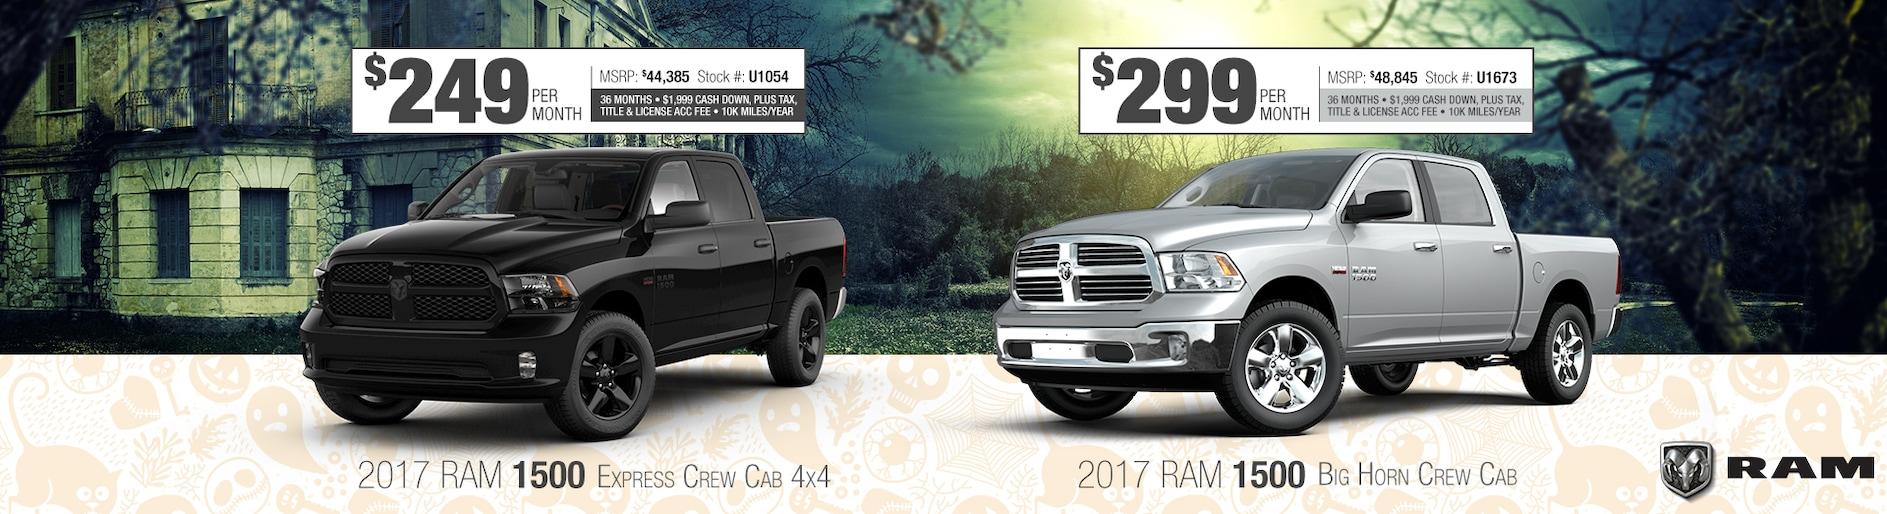 St paul new 2017 2018 chrysler dodge jeep ram used car for Fury motors south st paul mn